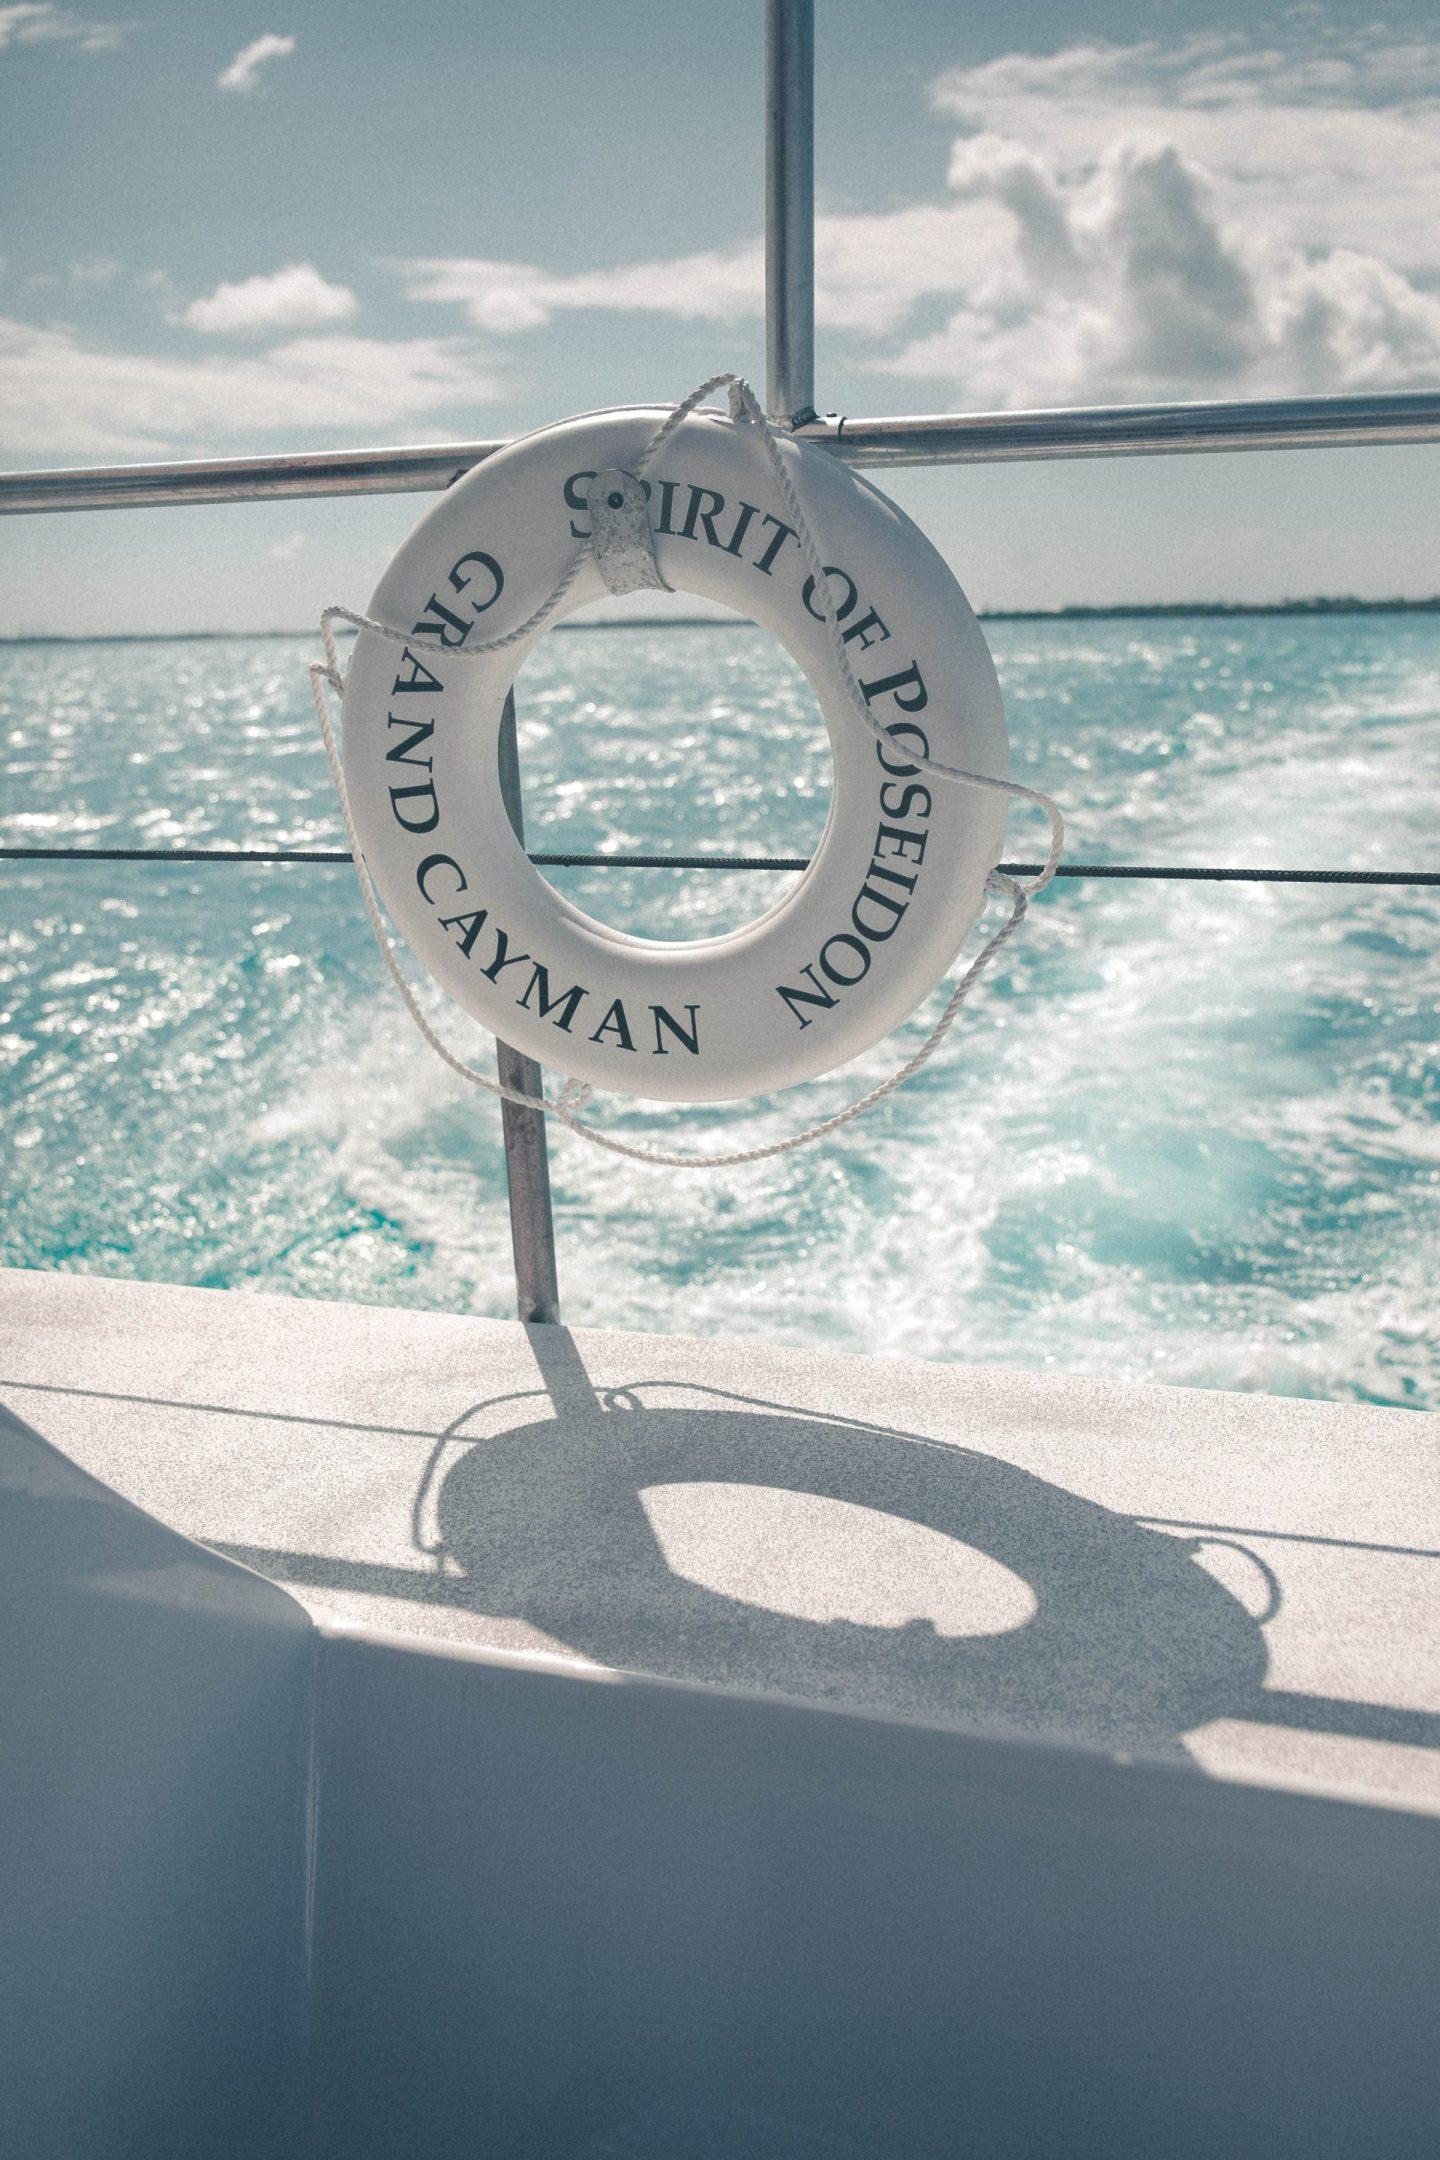 Stingray Bay Cayman Islands